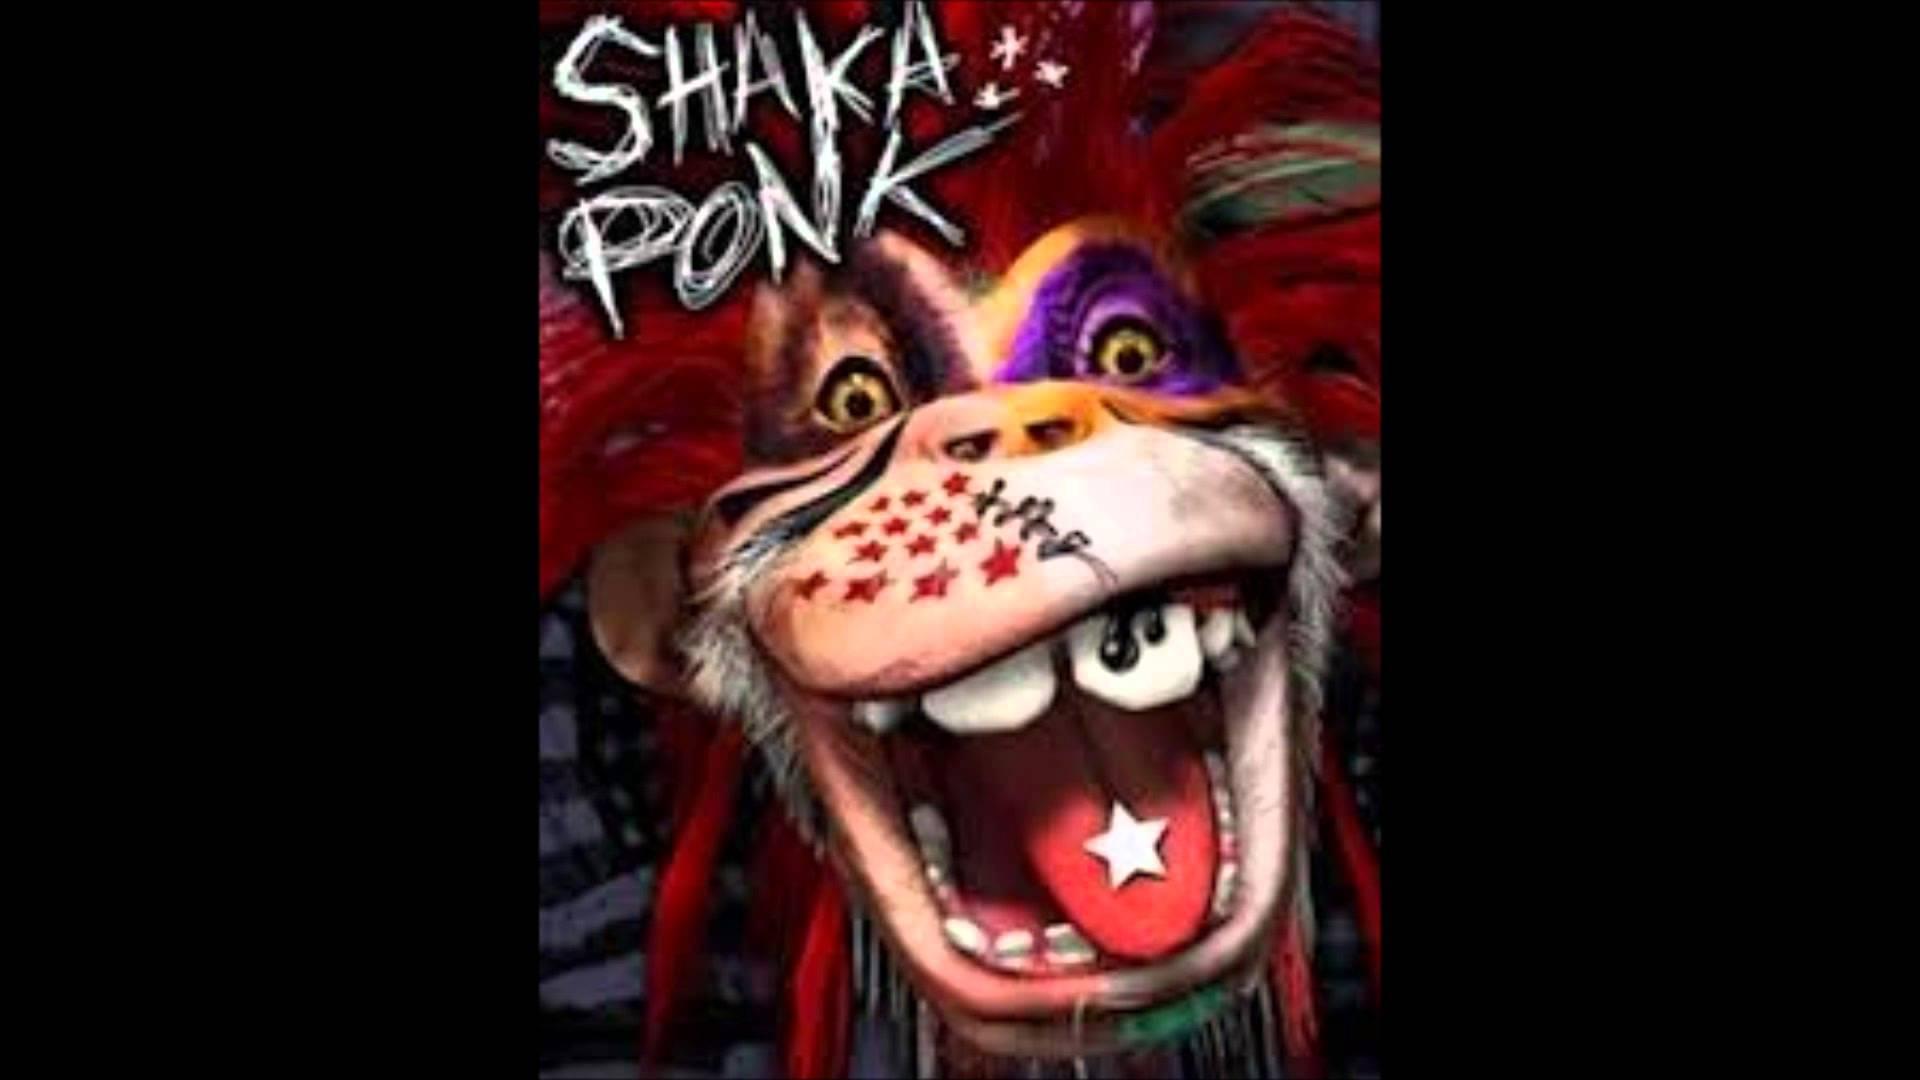 Shaka Ponk High Quality Background on Wallpapers Vista